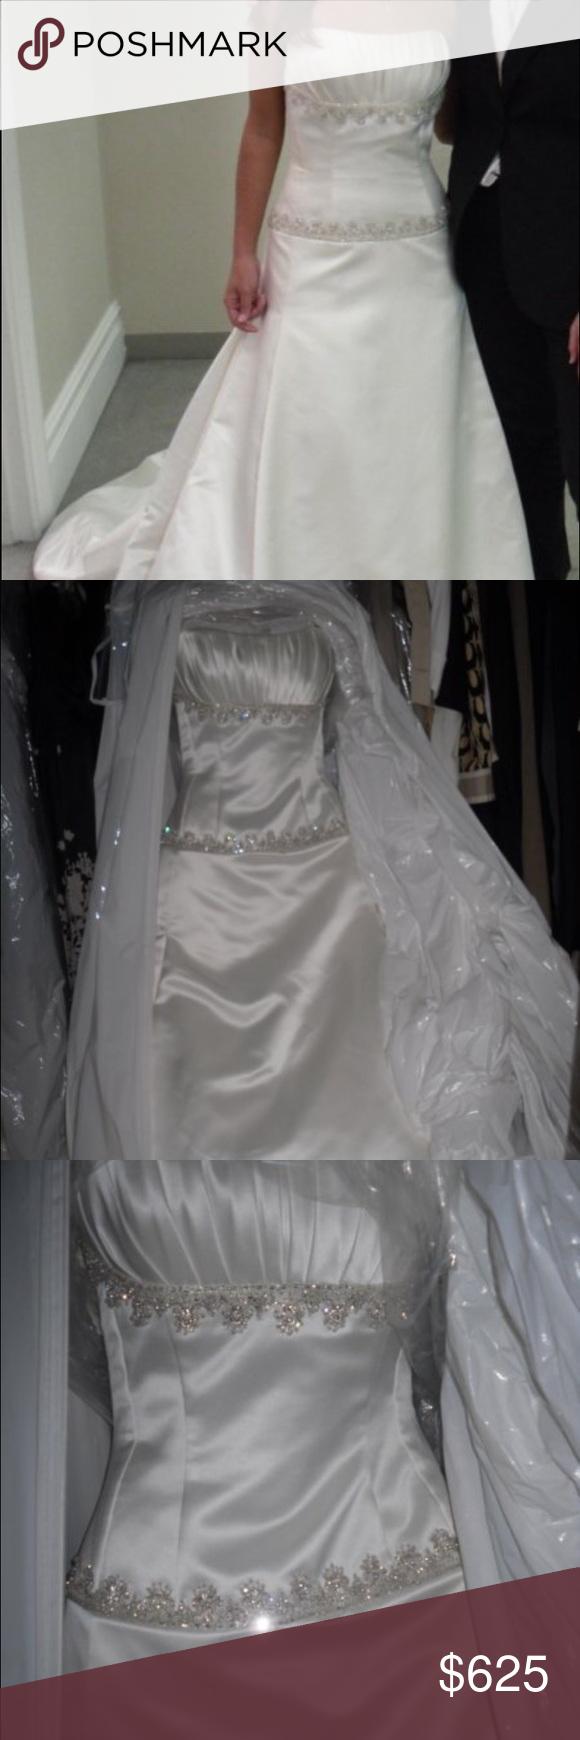 Kleinfeld's wedding dress, Henry Roth, new, size 2